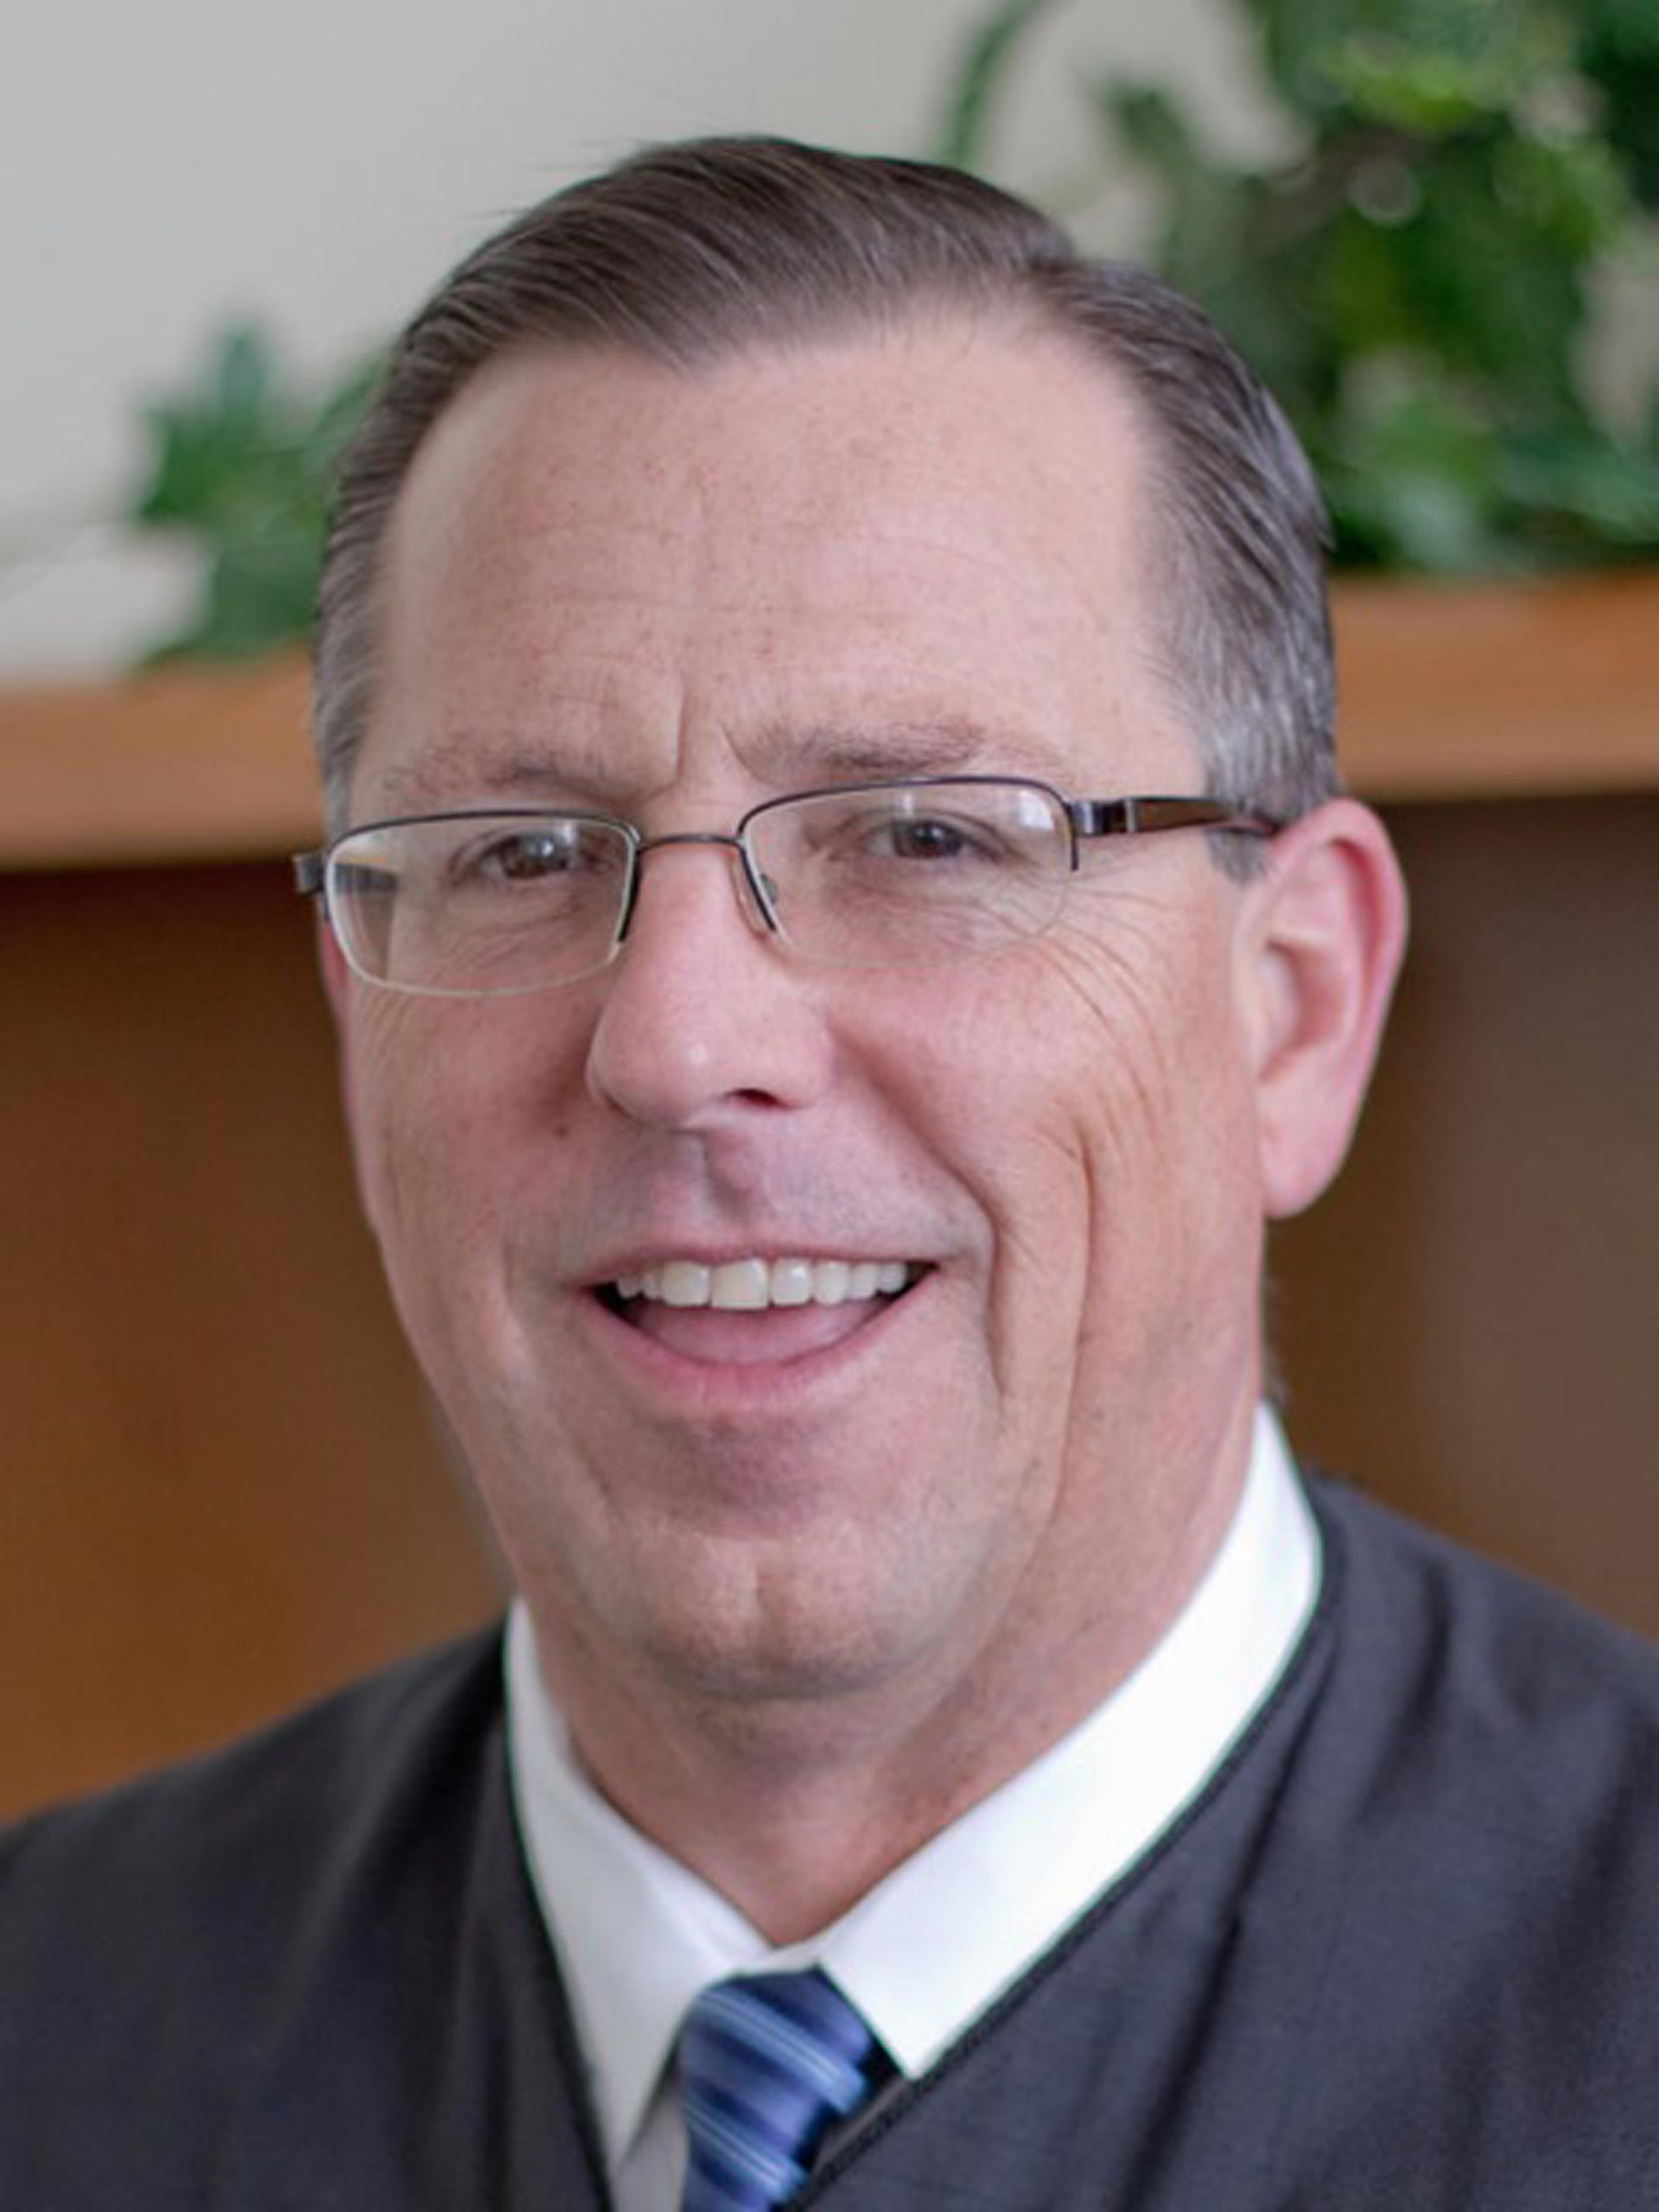 Contra Costa Presiding Superior Court Judge Steven Austin